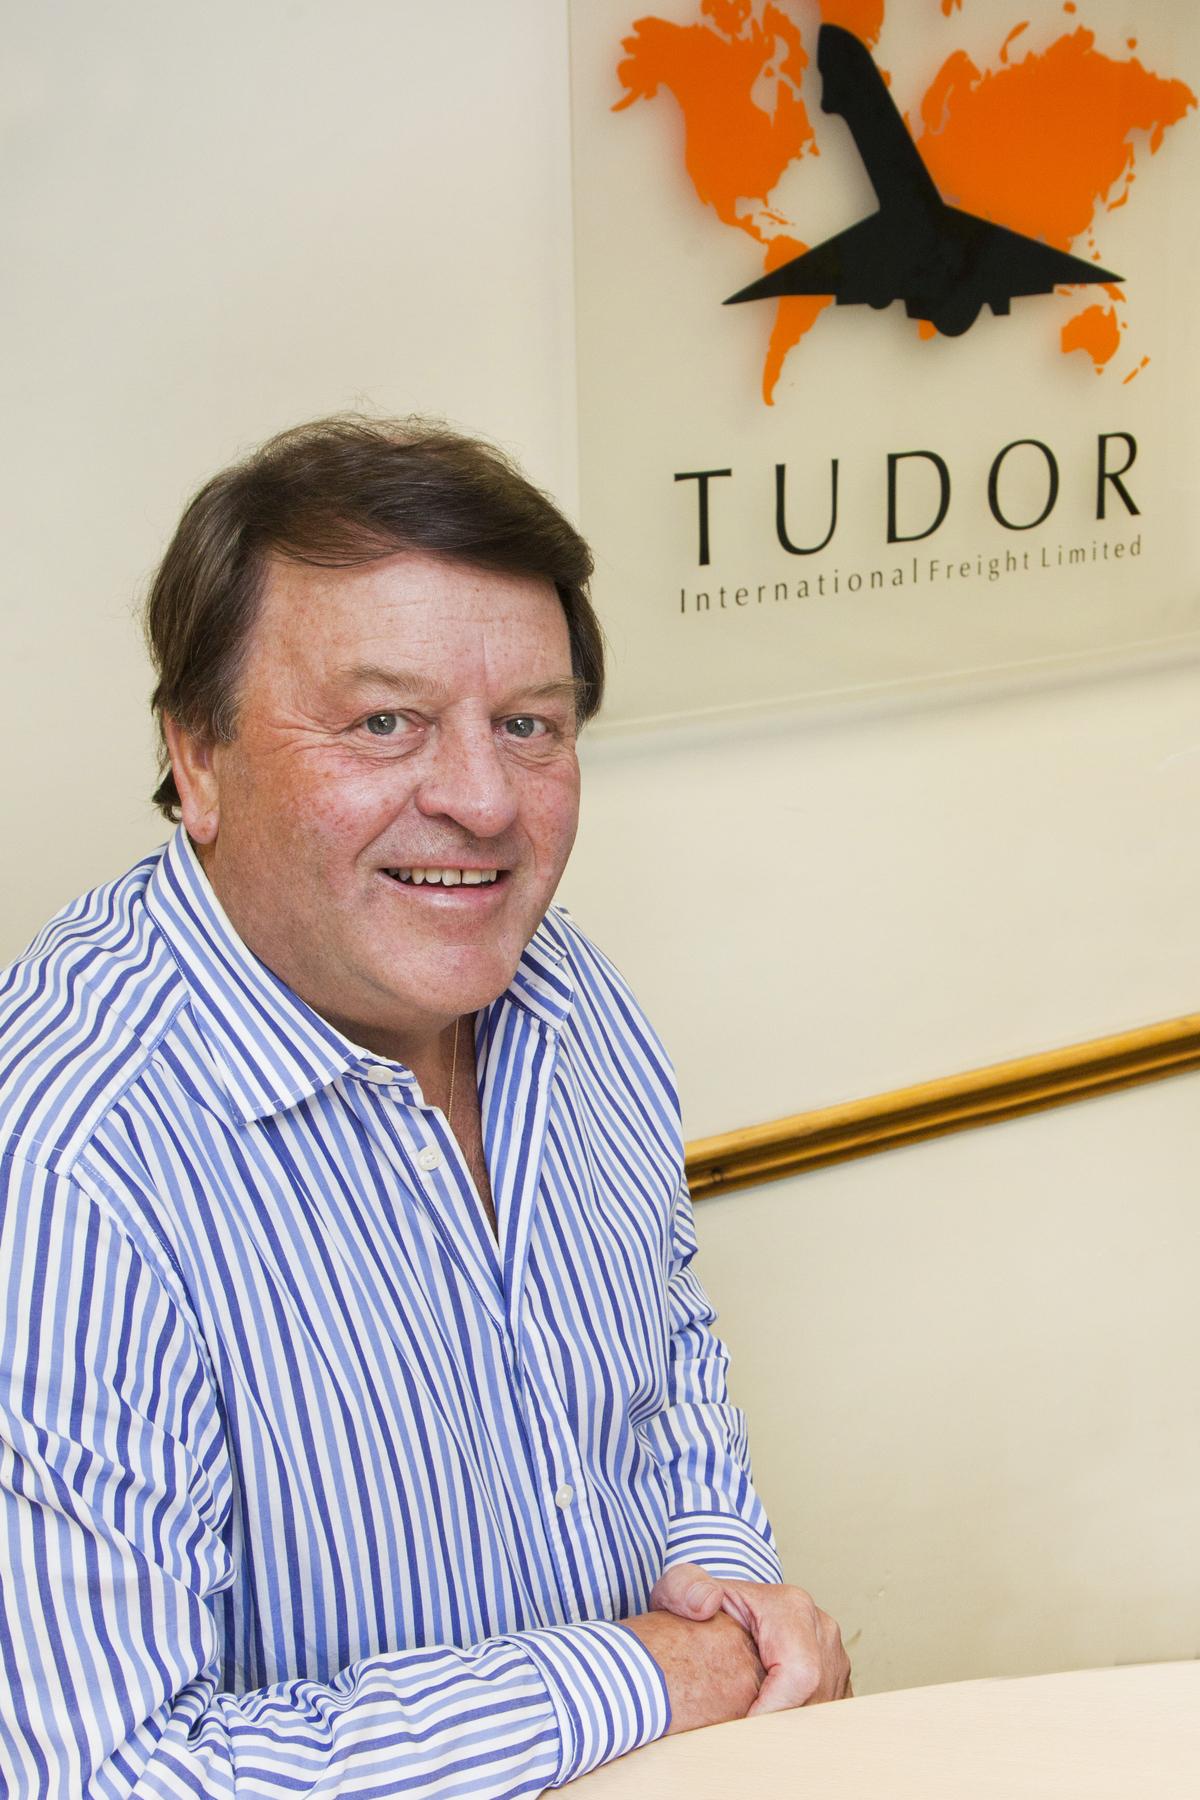 David Johnson, managing director, Tudor International Freight